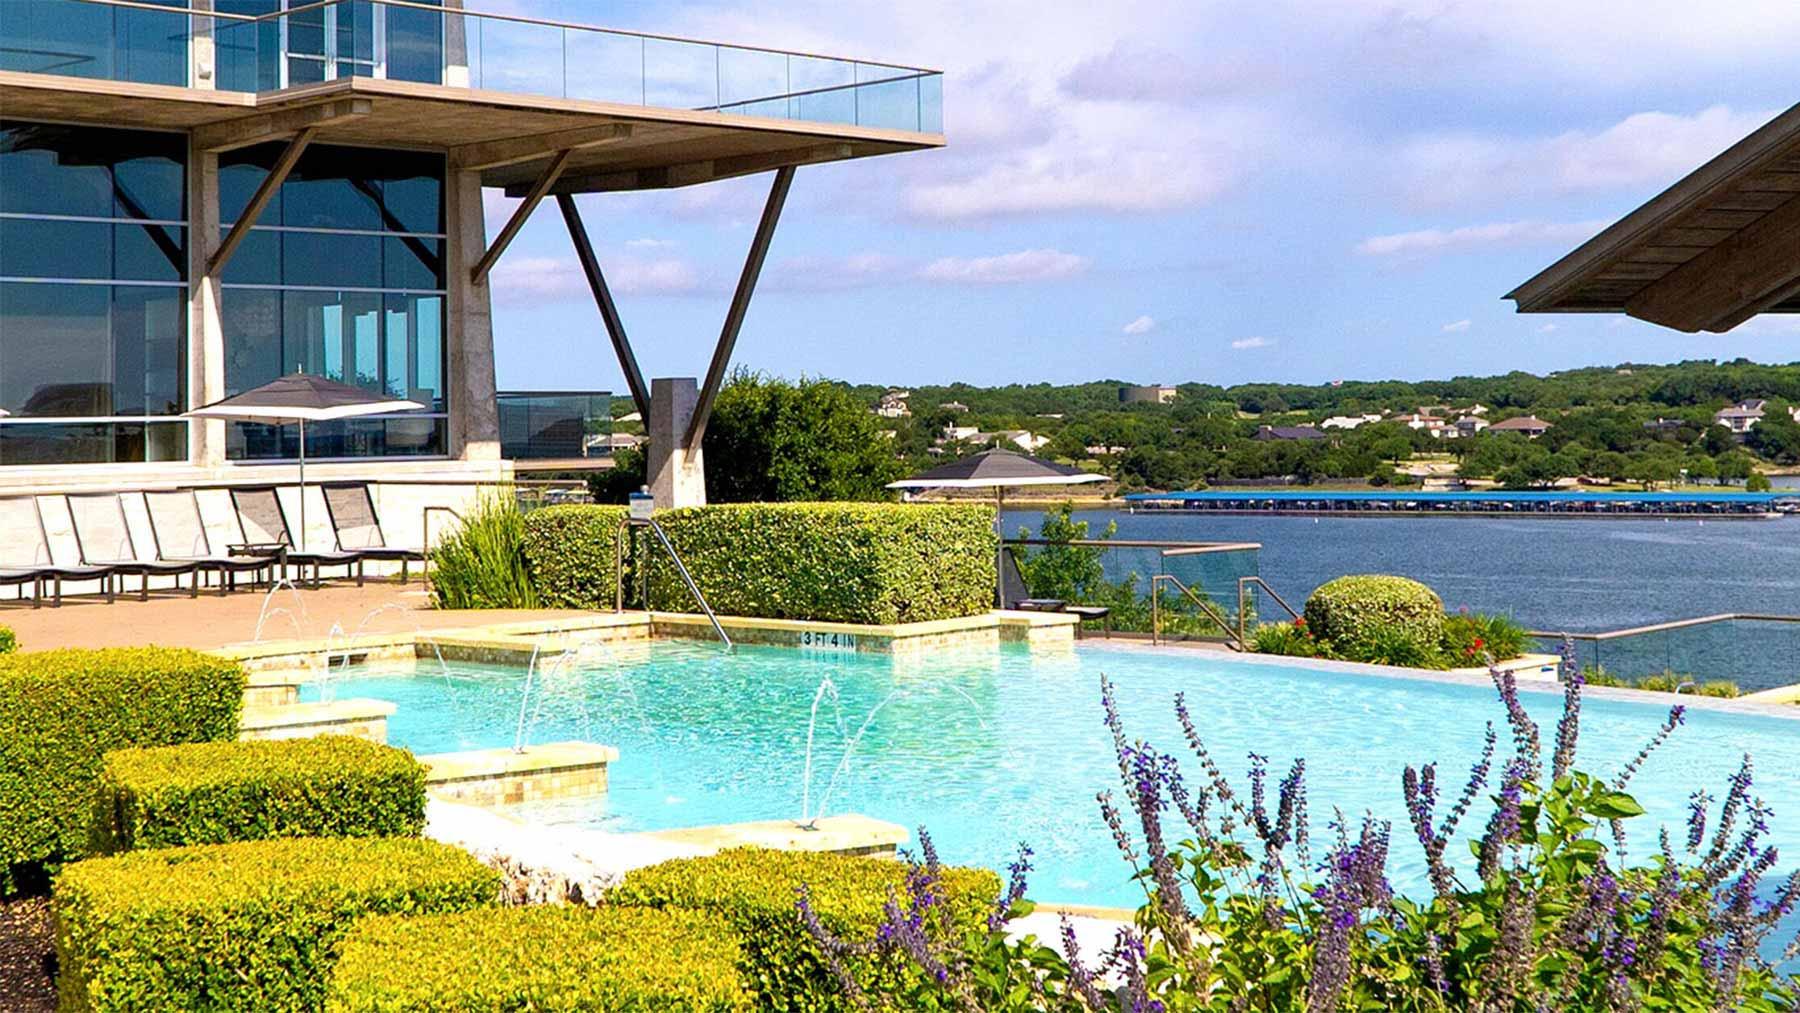 Lakeway Resort & Spa: A Texas Hill Country Resort on Lake Travis